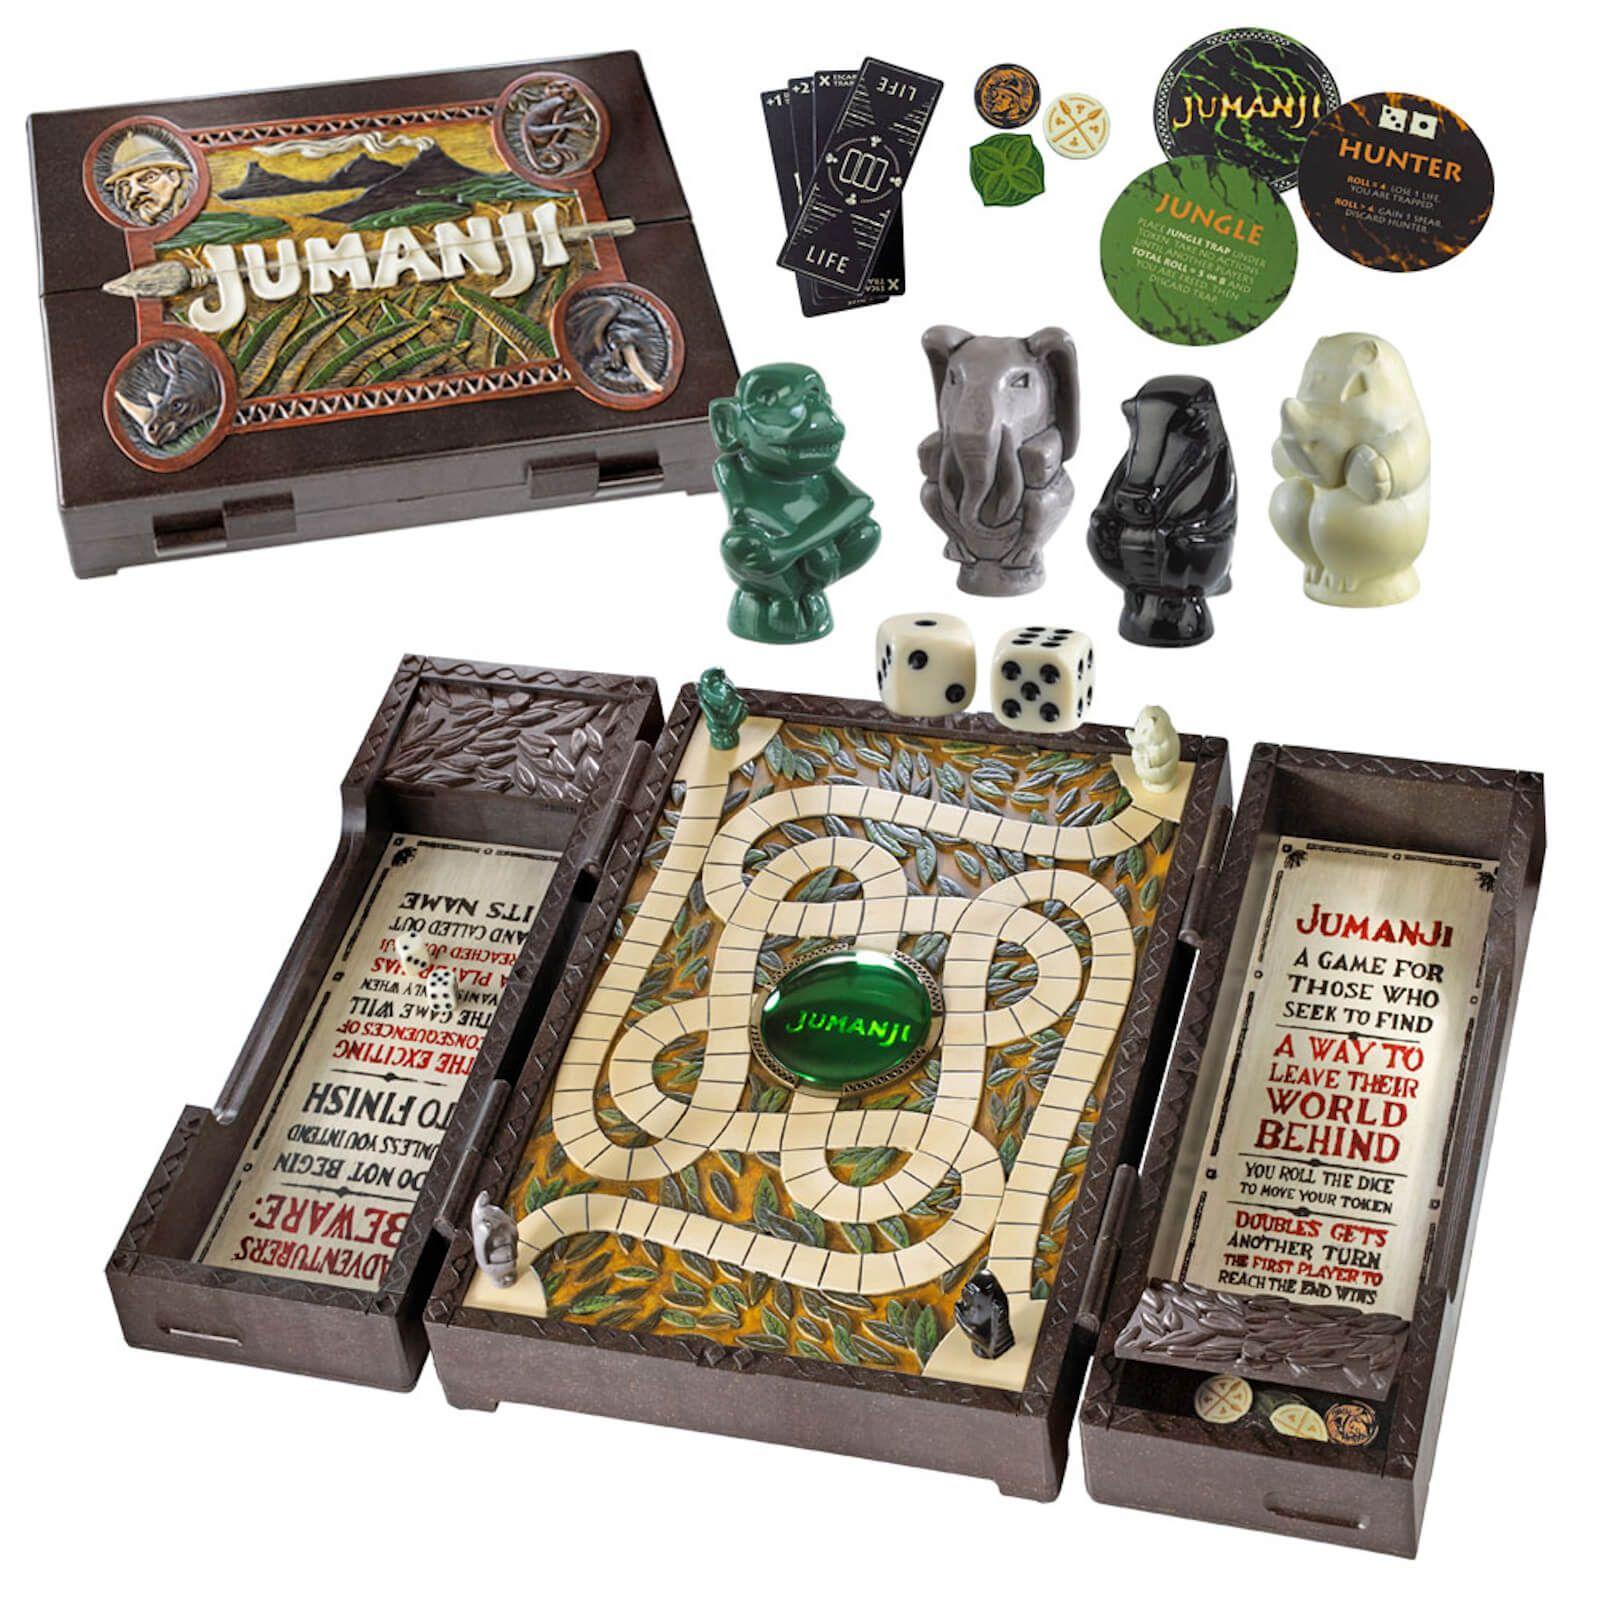 Jumanji Collector Board Game Replica in 2020 Jumanji